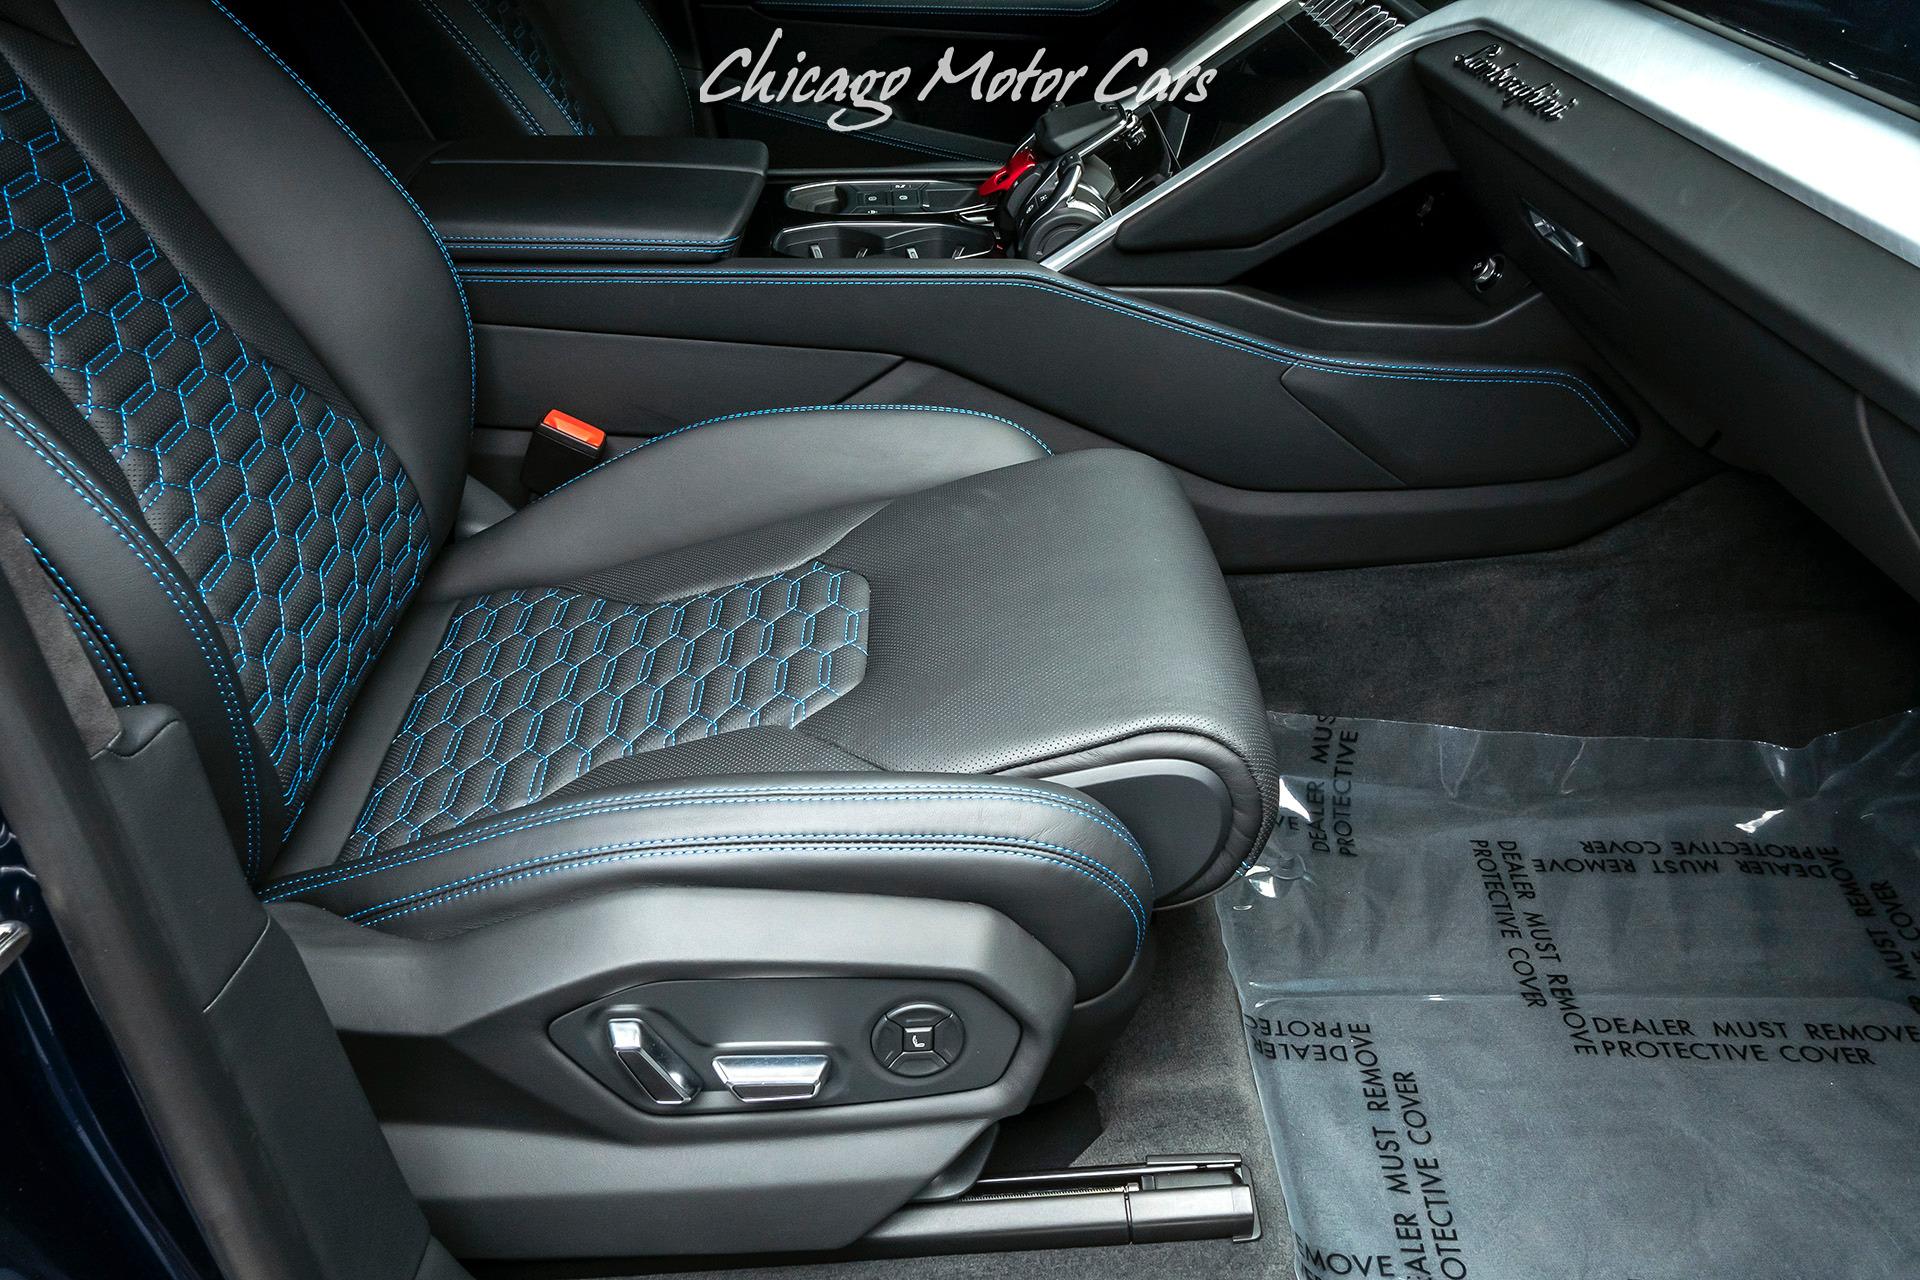 Used-2019-Lamborghini-Urus-SUV-MSRP-241K-REAR-SEAT-ENTERTAINMENT